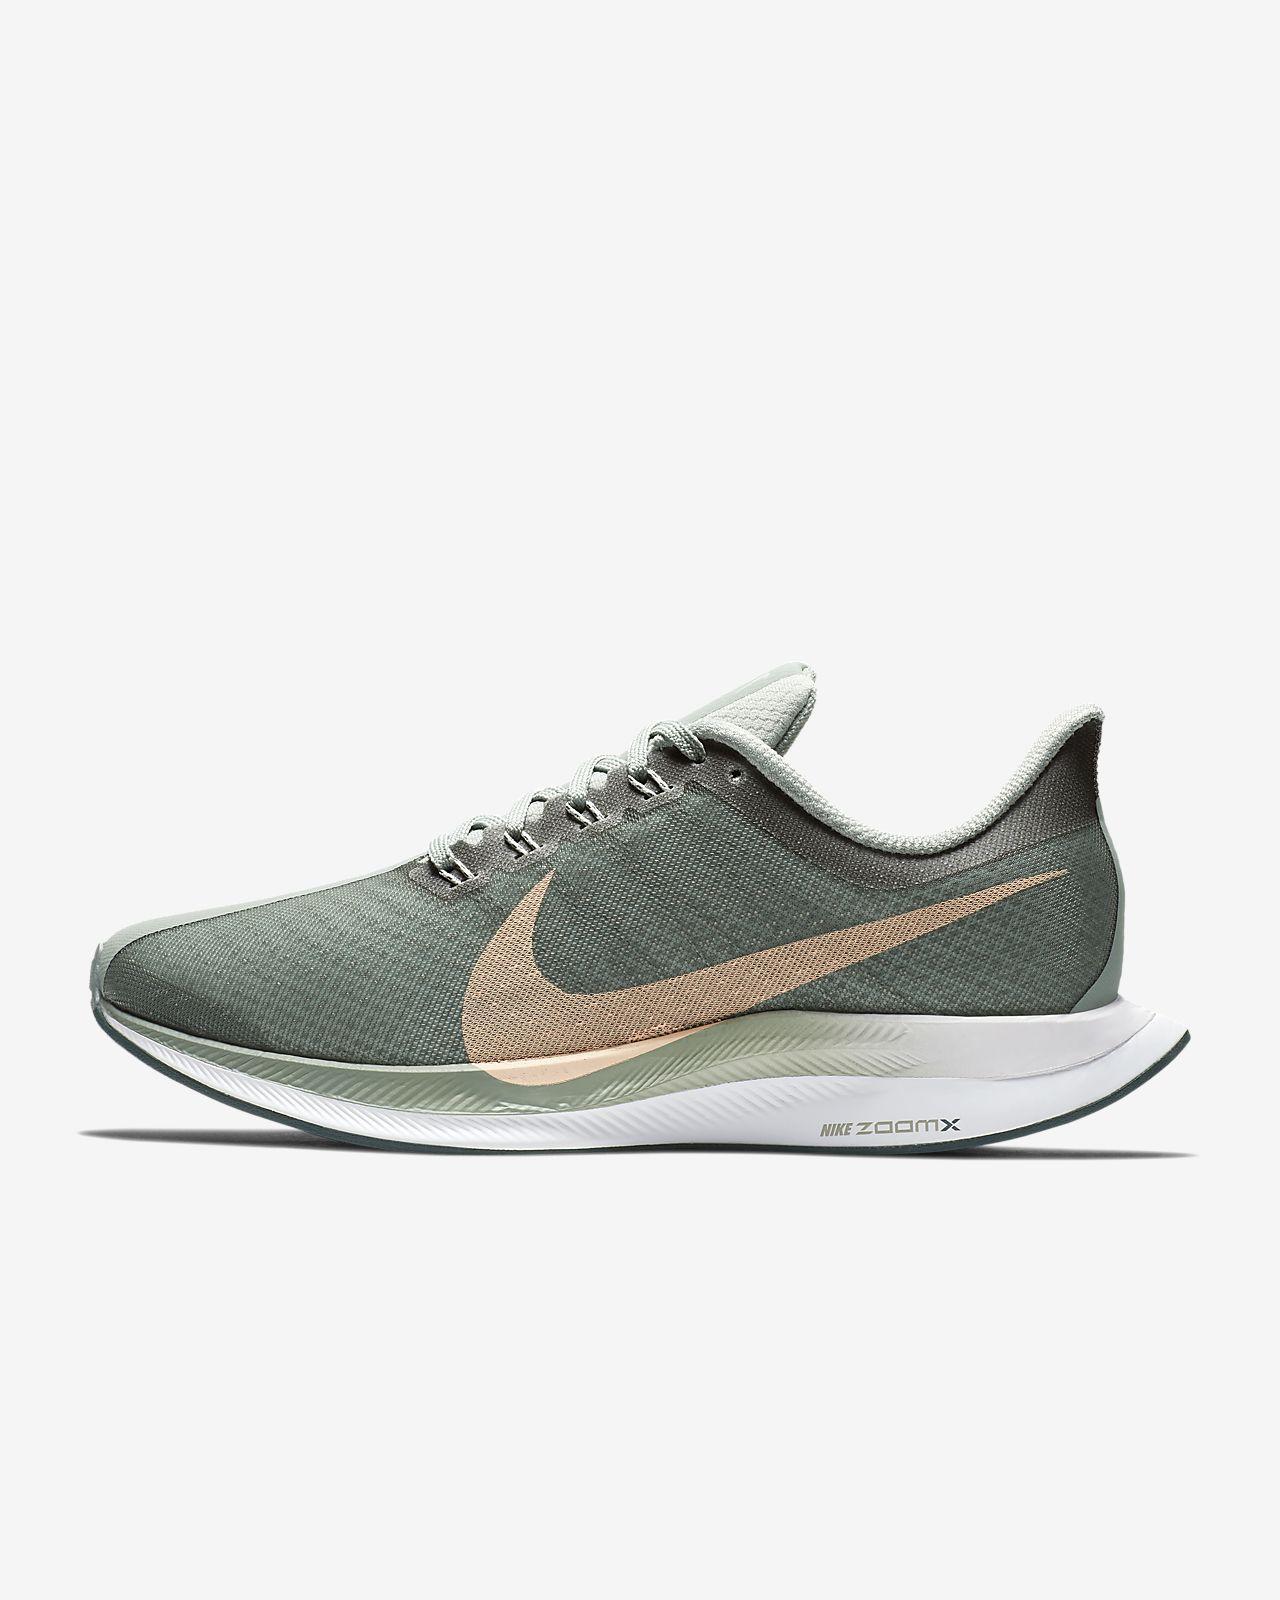 Nike Zoom Pegasus Turbo Damen-Laufschuh